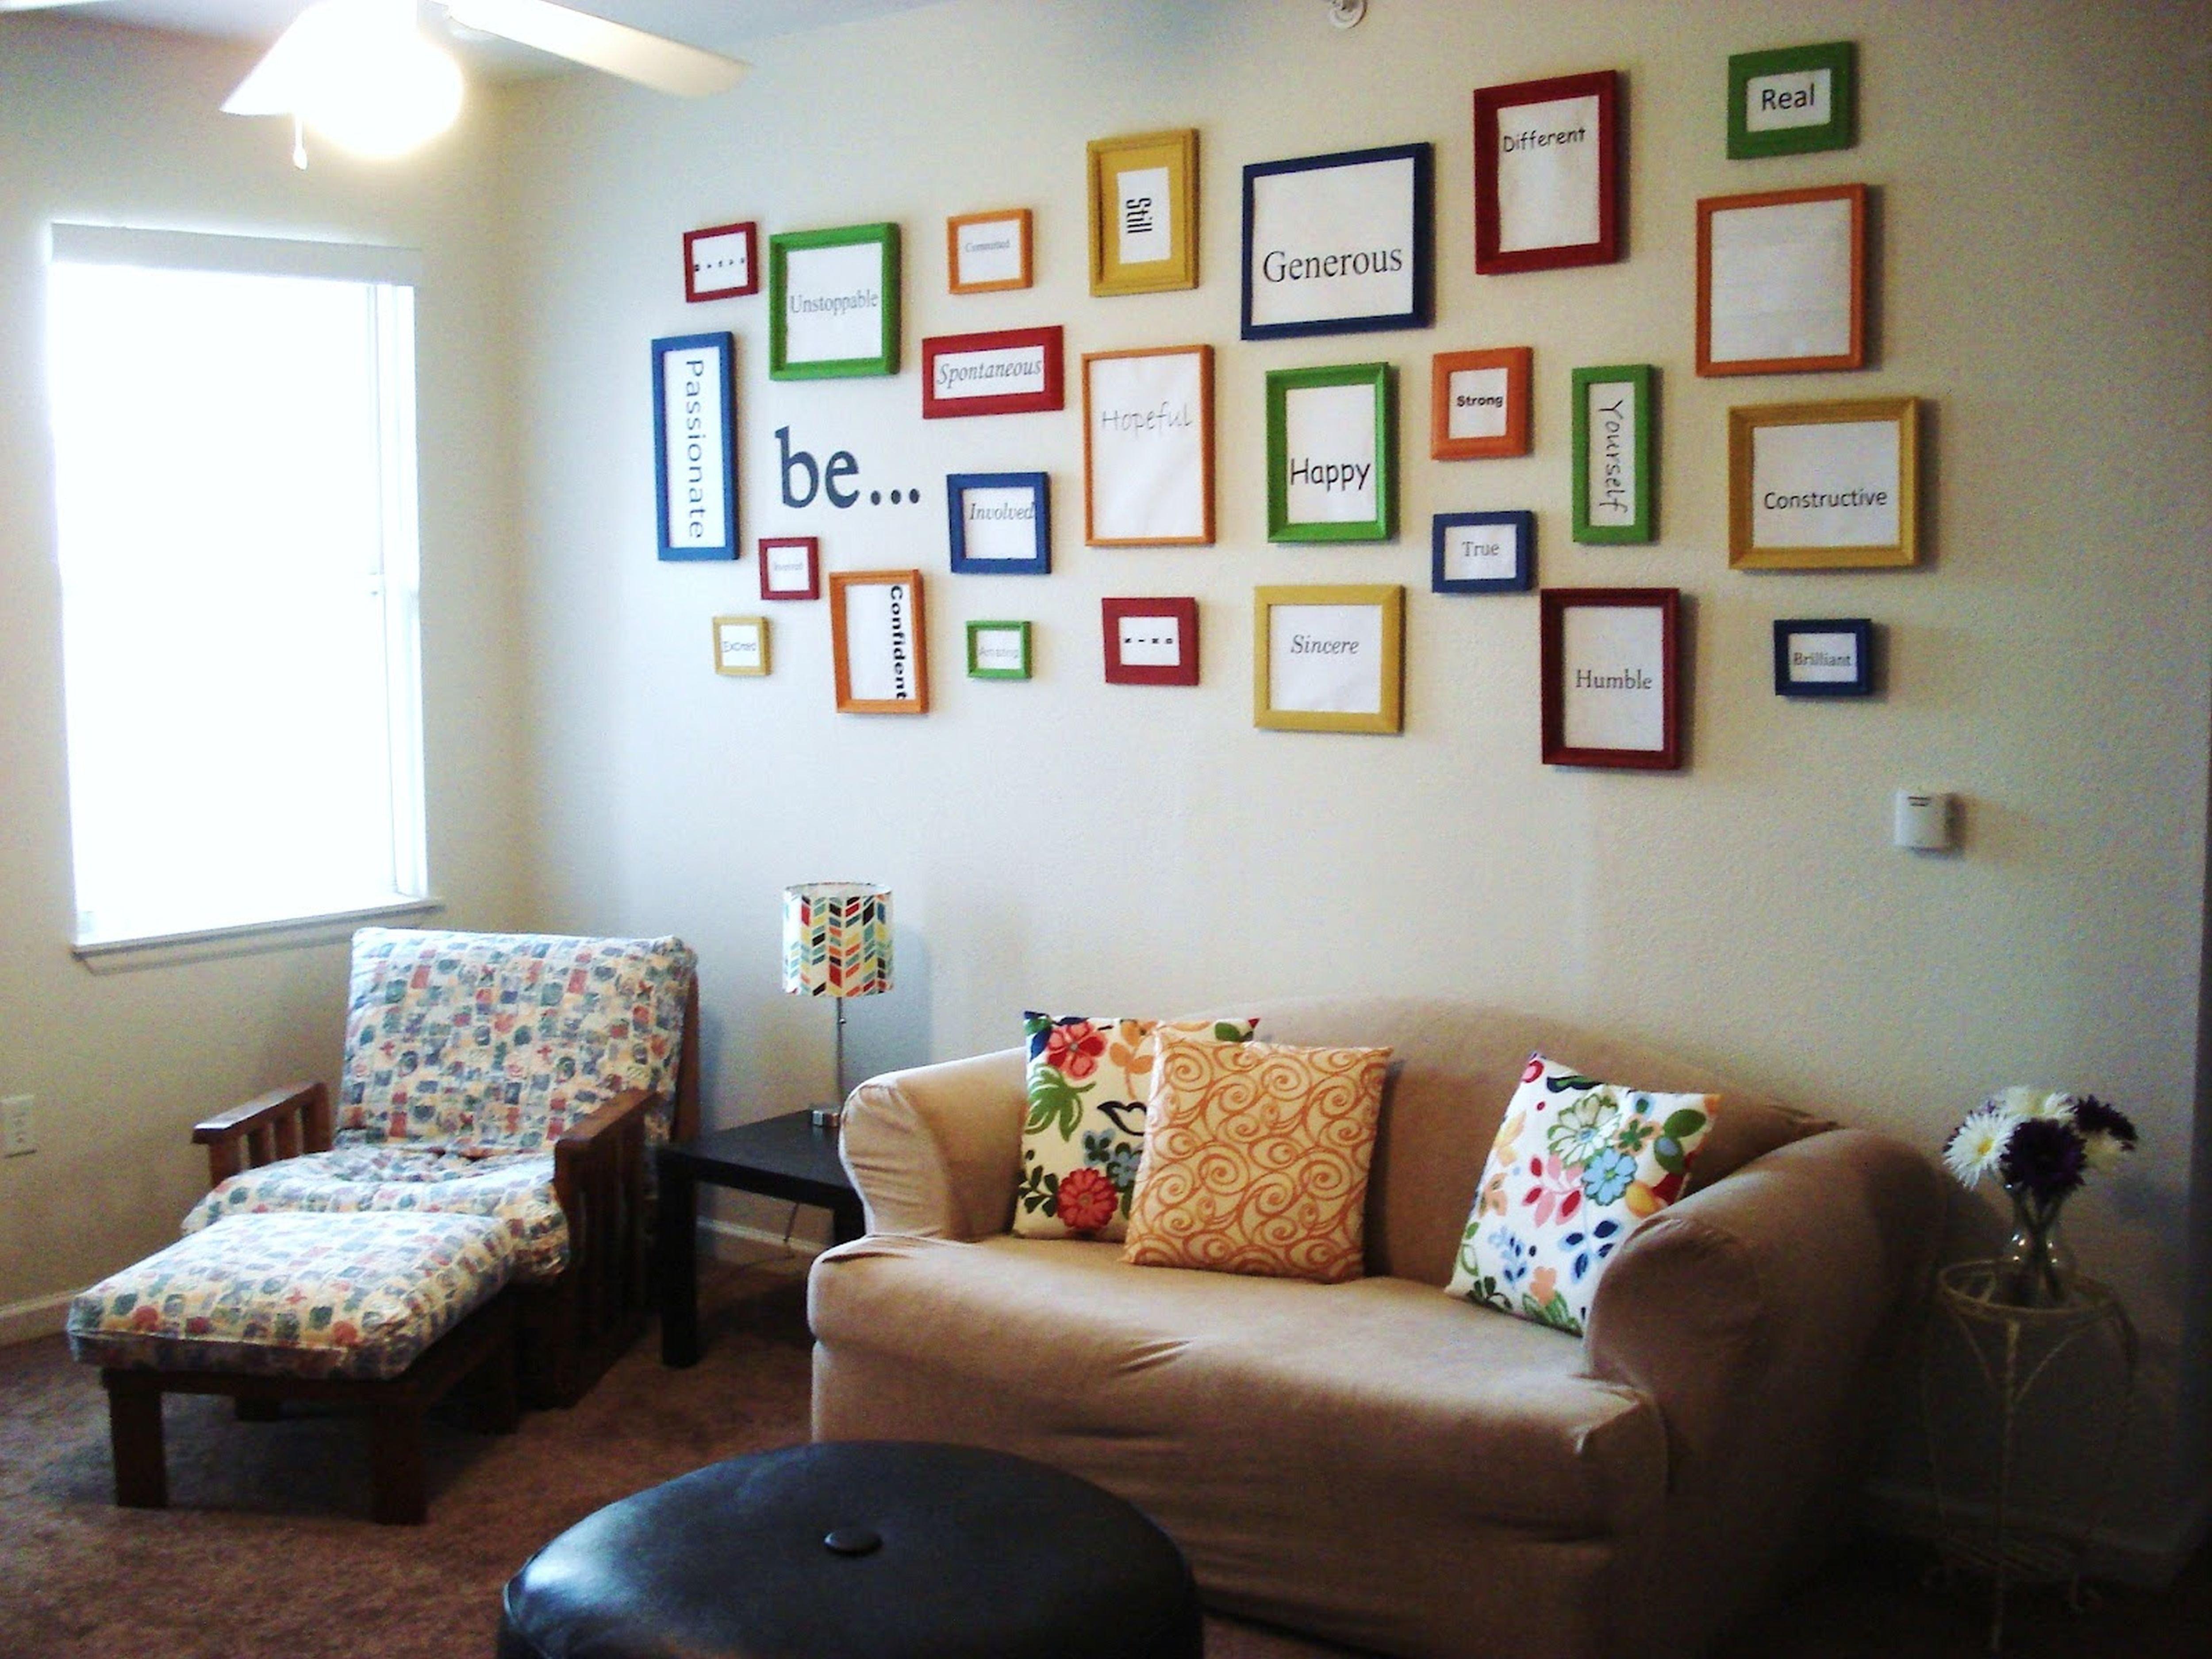 10 Most Popular Diy Decorating Ideas For Apartments decorations p scenic bedroom decorating ideas diy loversiq 2020